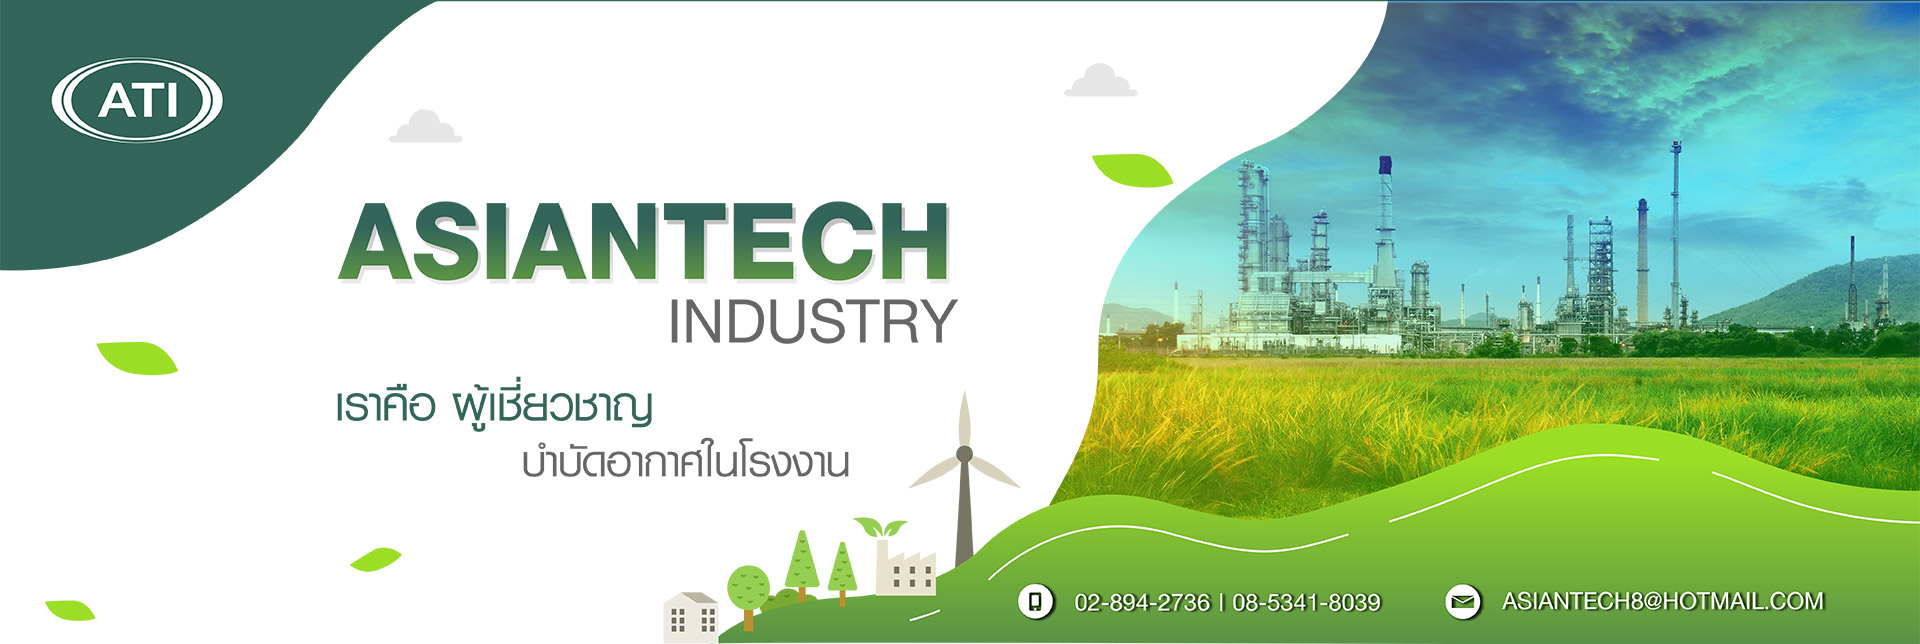 https://www.asiantechindustry.com